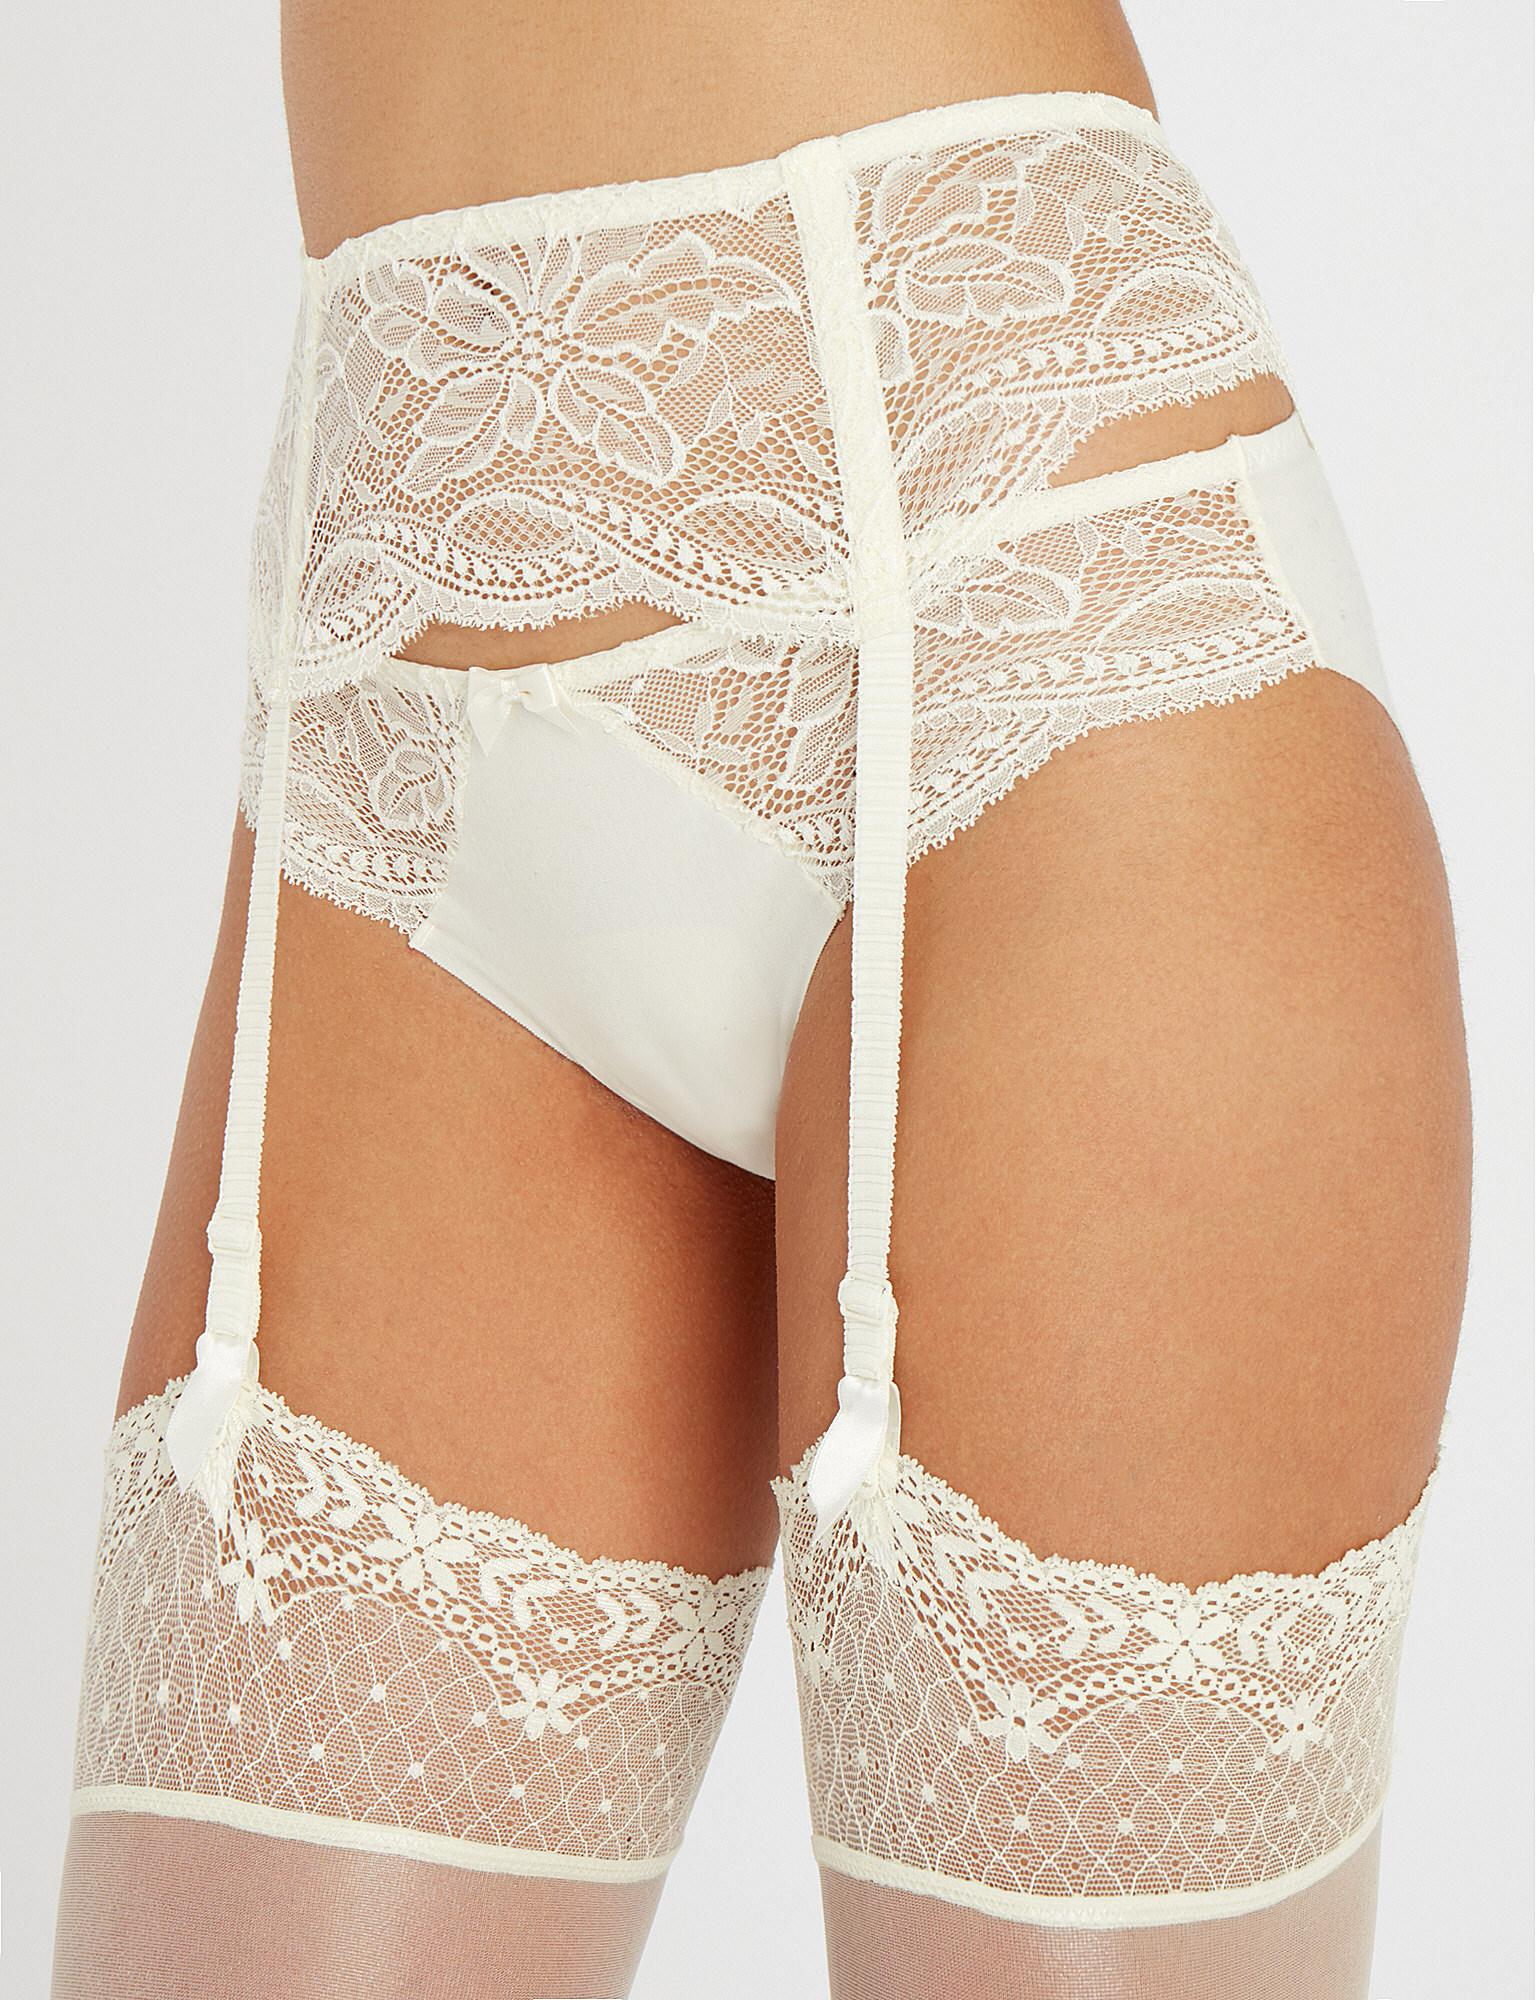 92758a34aca Simone Perele Eden Lace Suspender Belt in White - Lyst